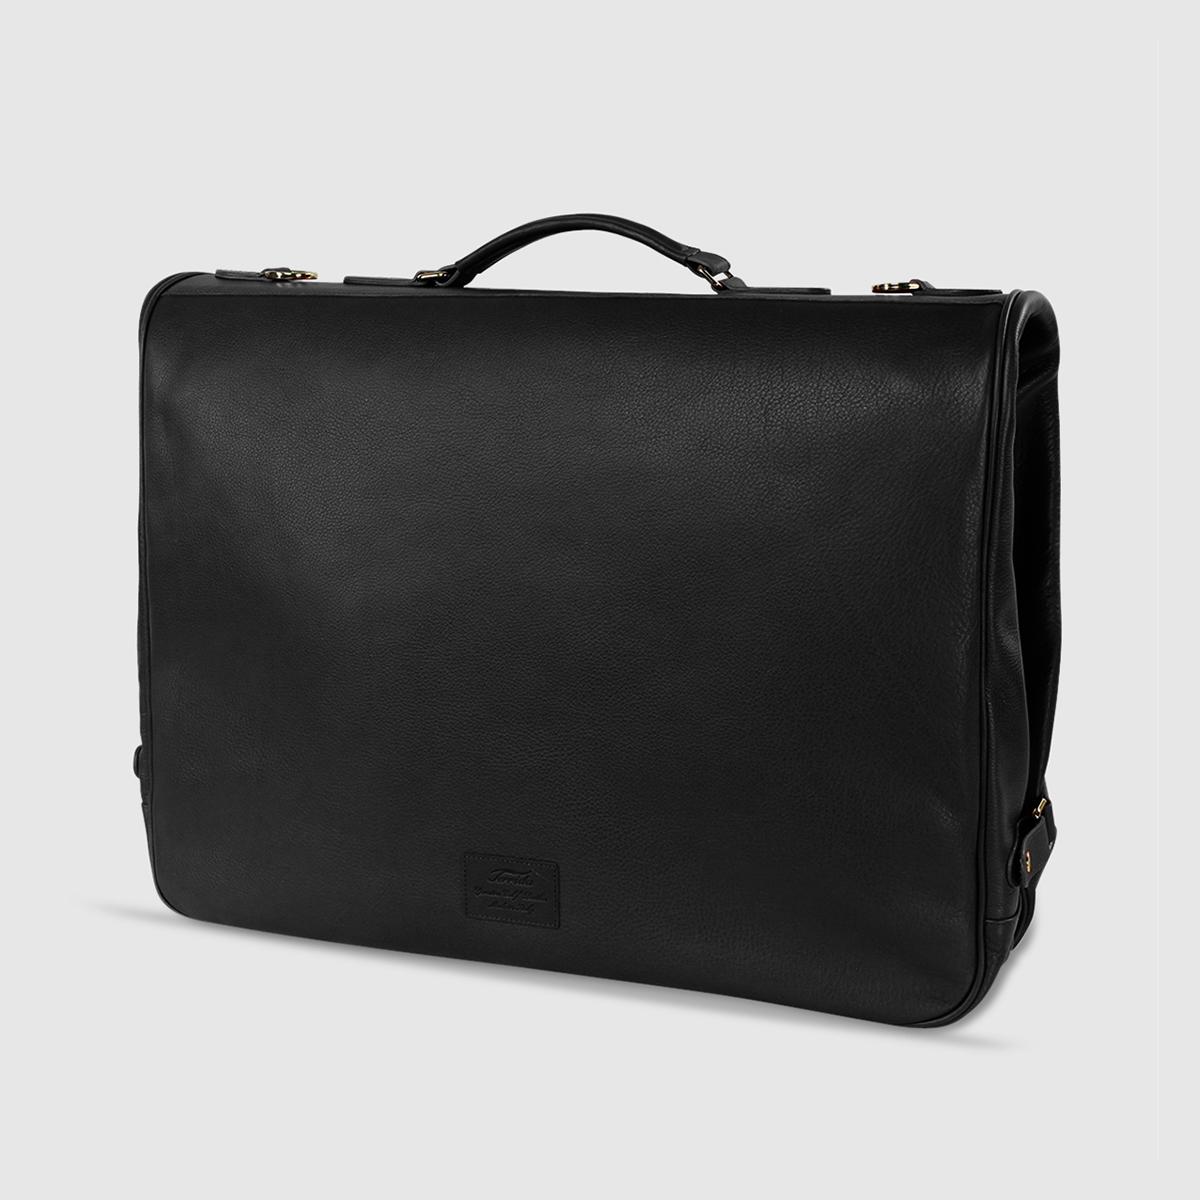 Suitcase da viaggio in pelle